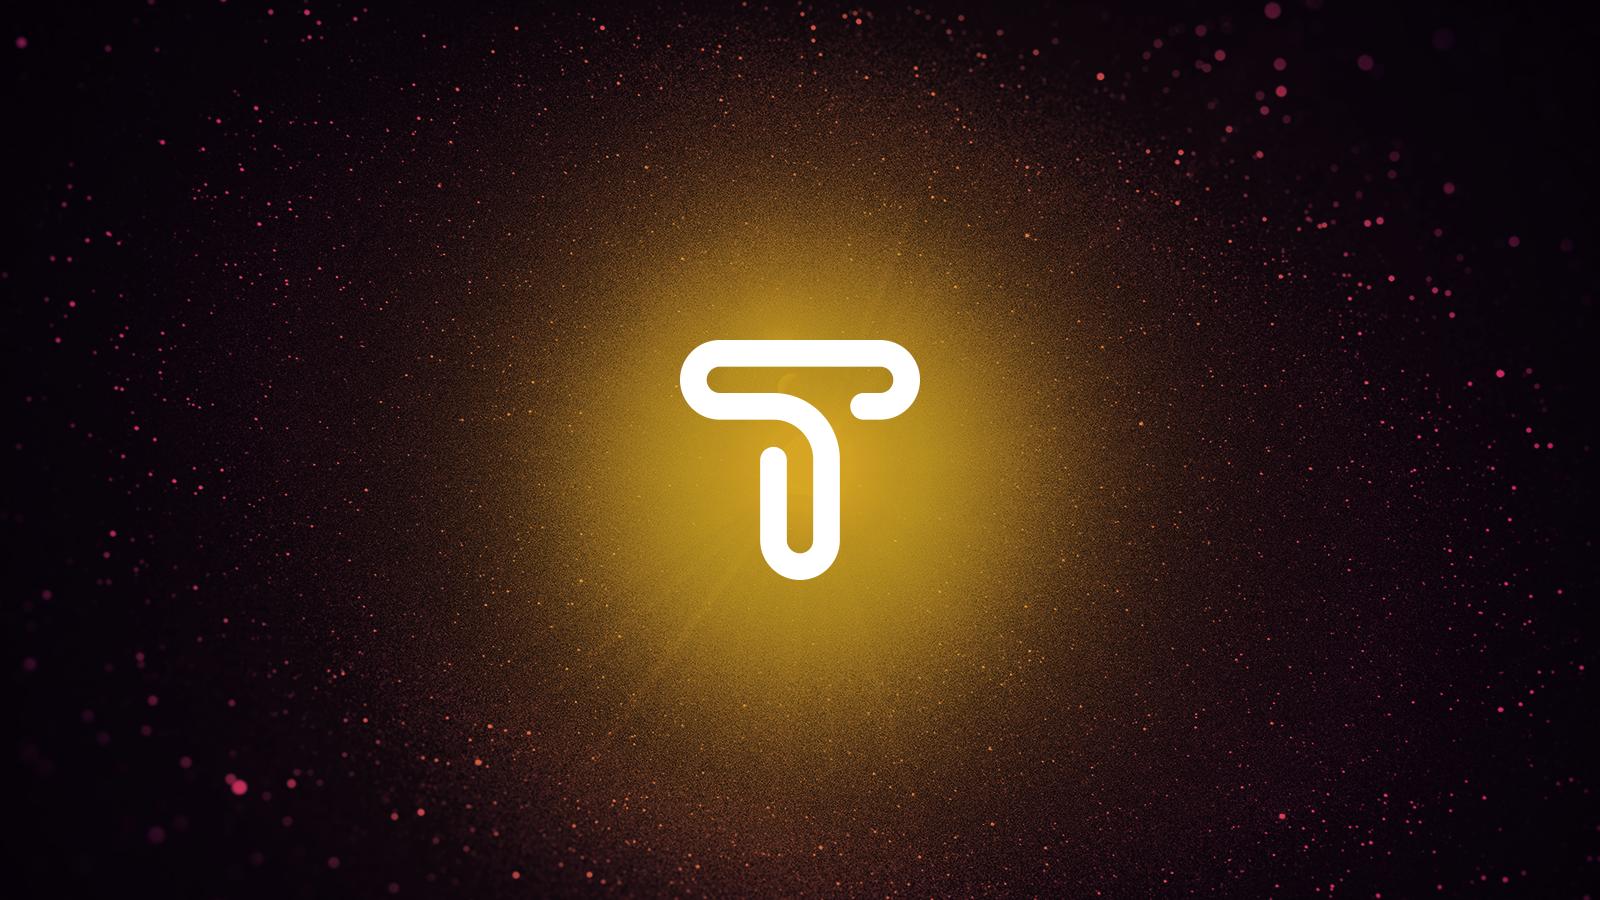 Totelic-Redux-v2Totelic-1.png